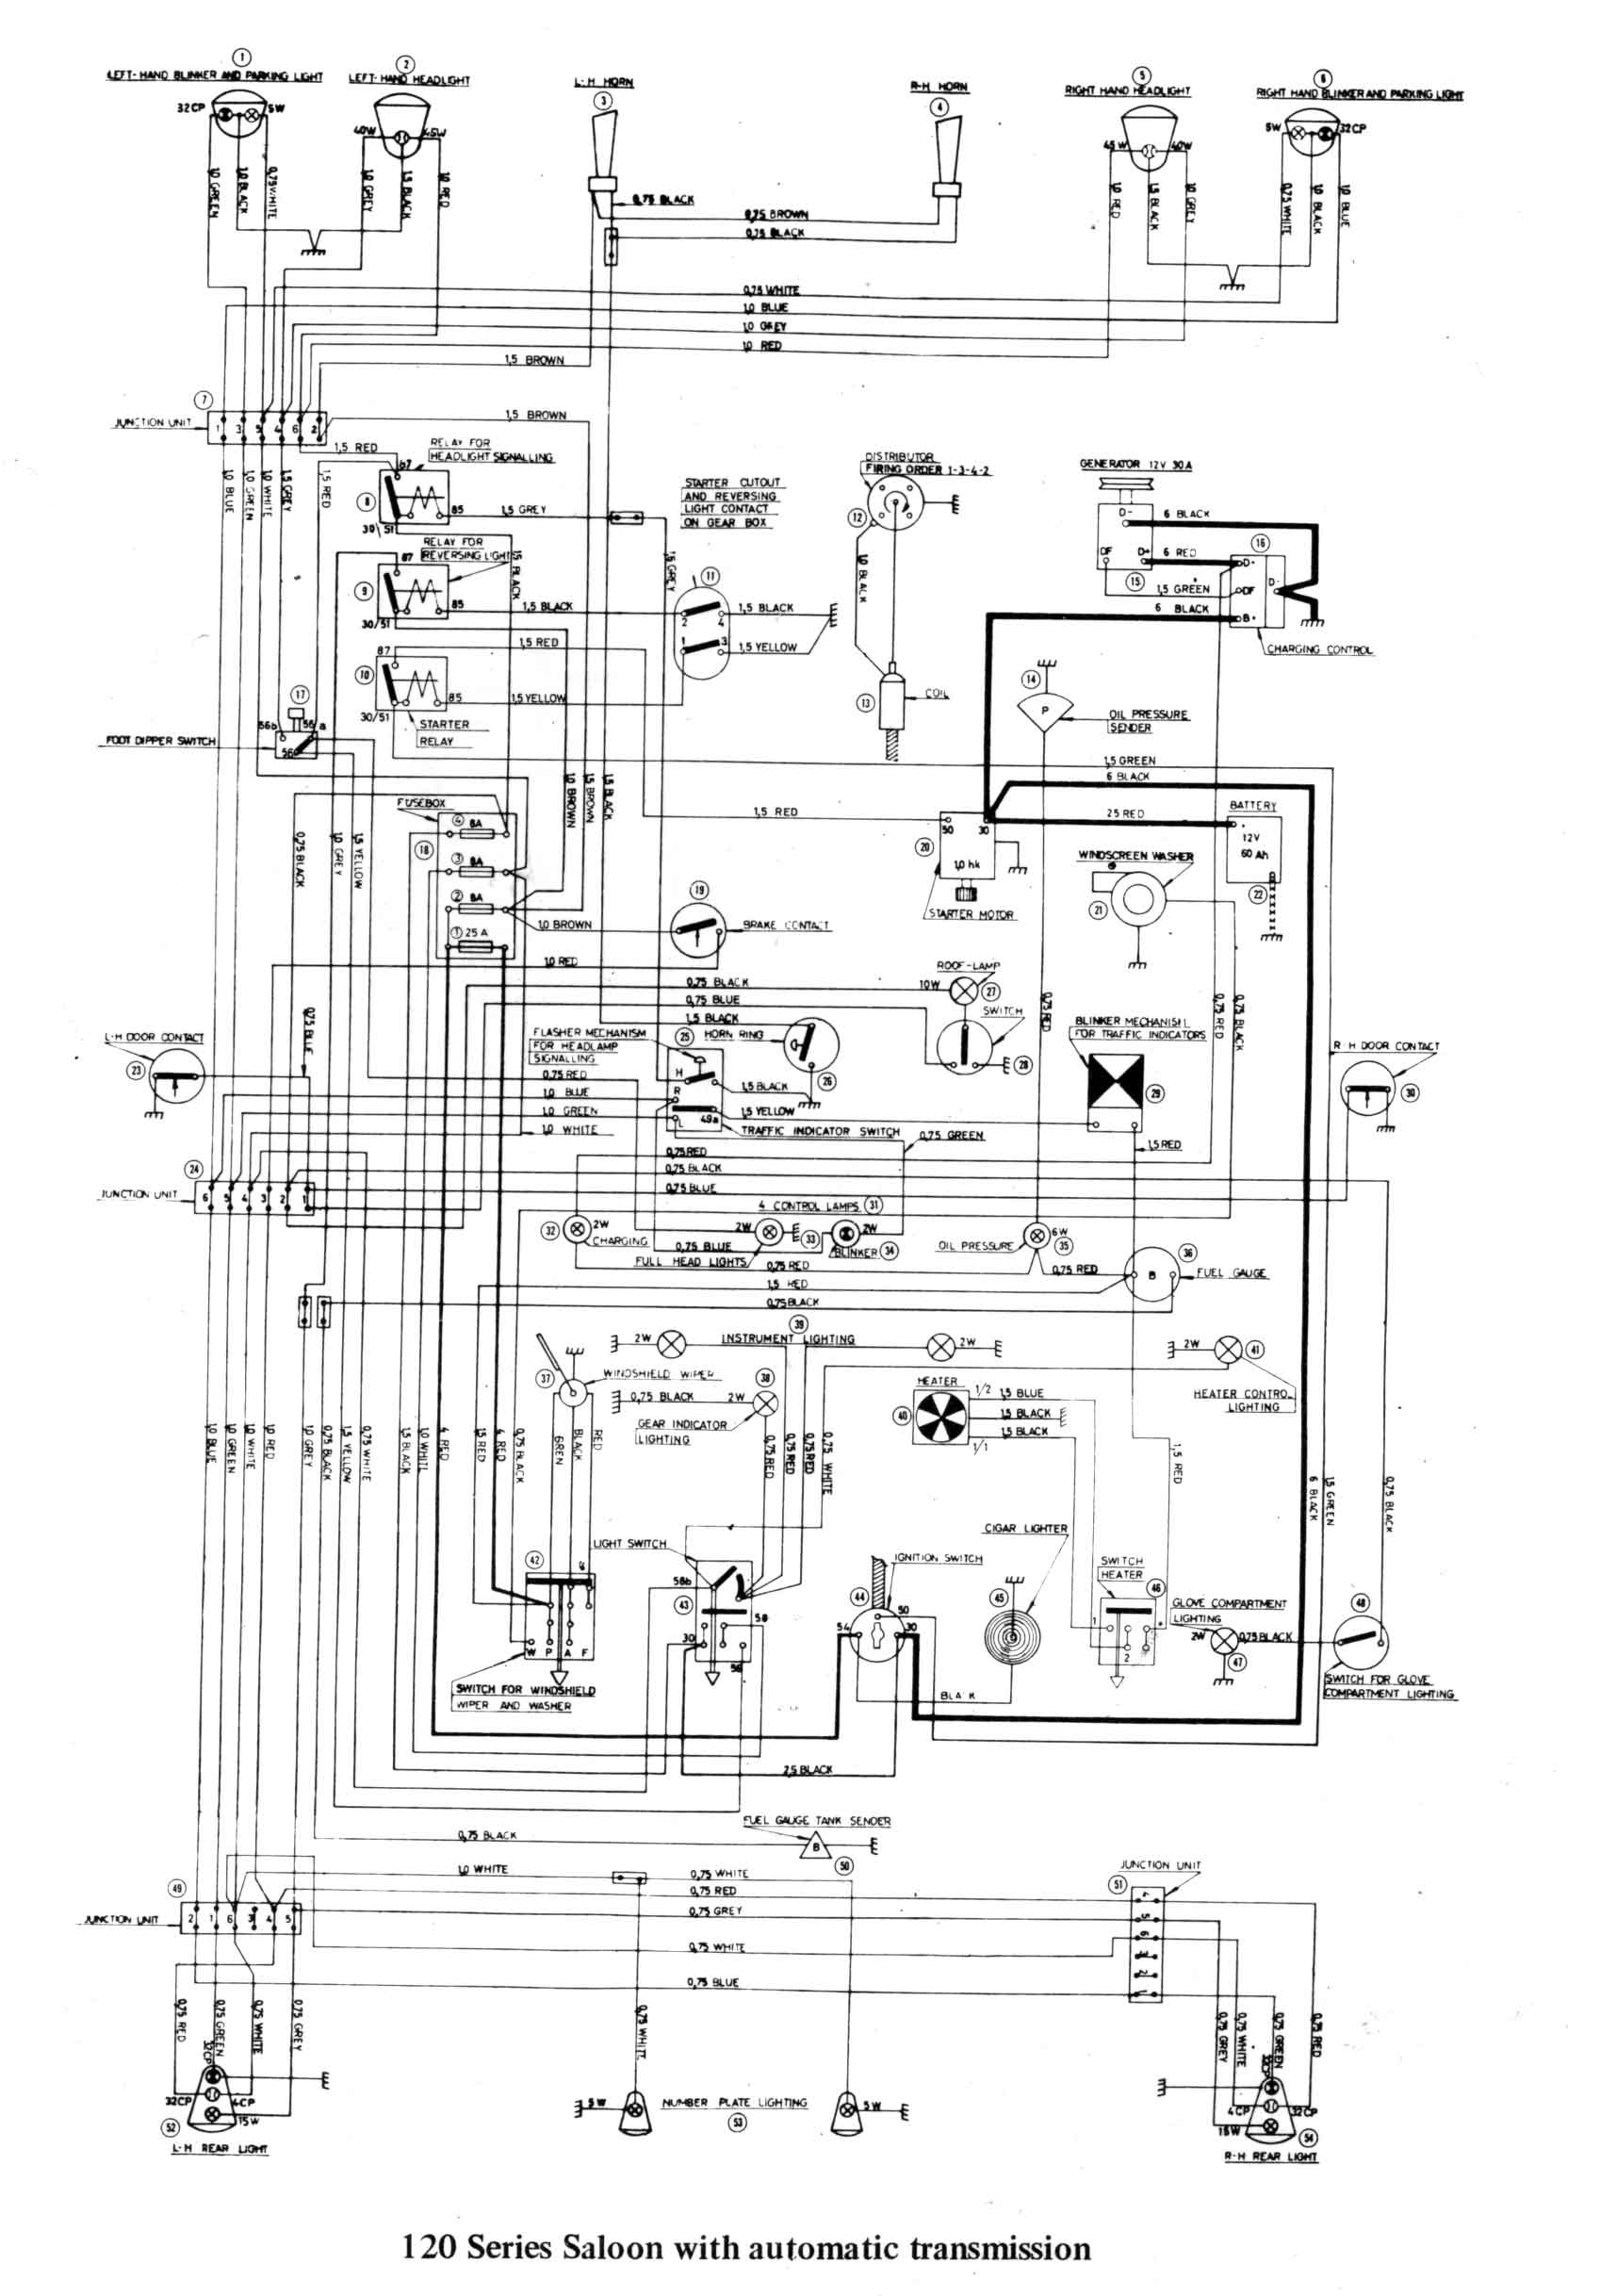 94 Mack Fuse Box | Wiring Library - Freightliner Headlight Wiring Diagram